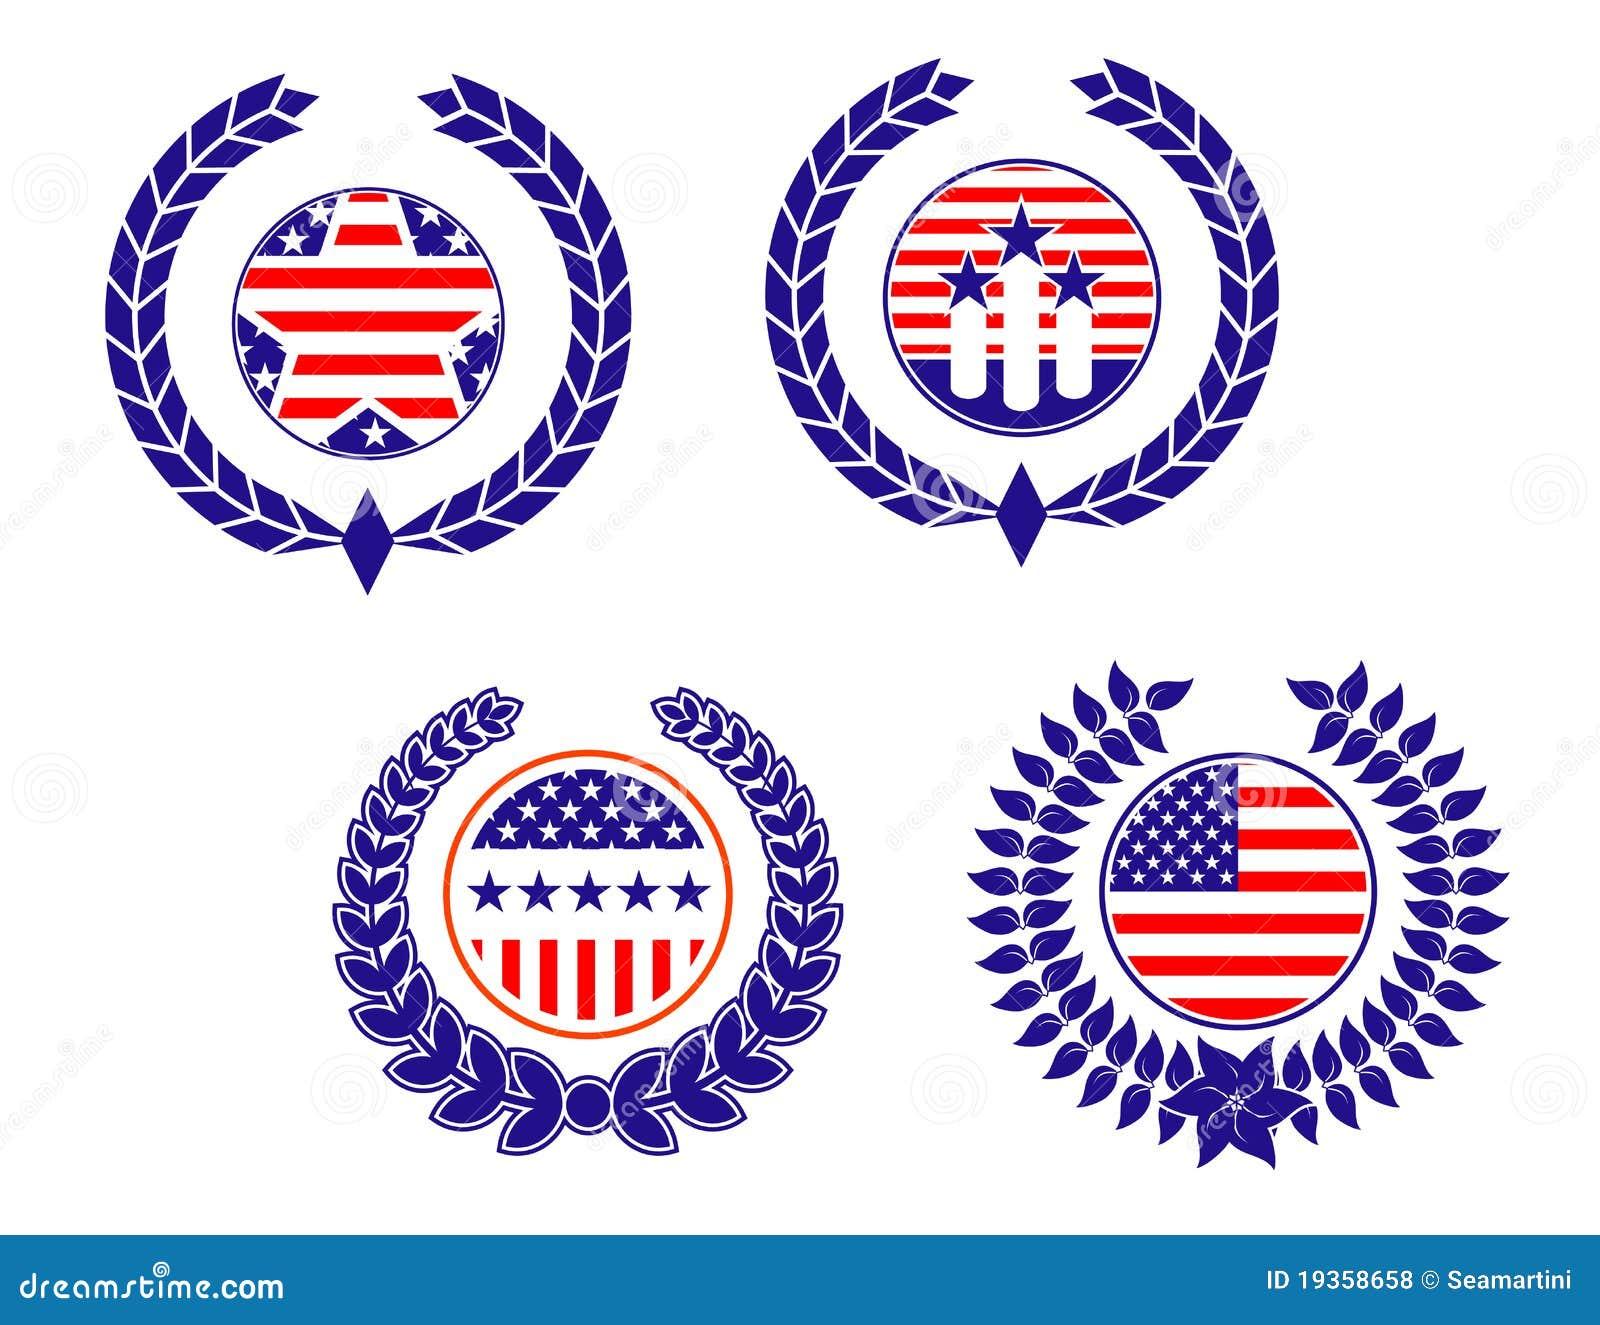 Símbolos patrióticos americanos